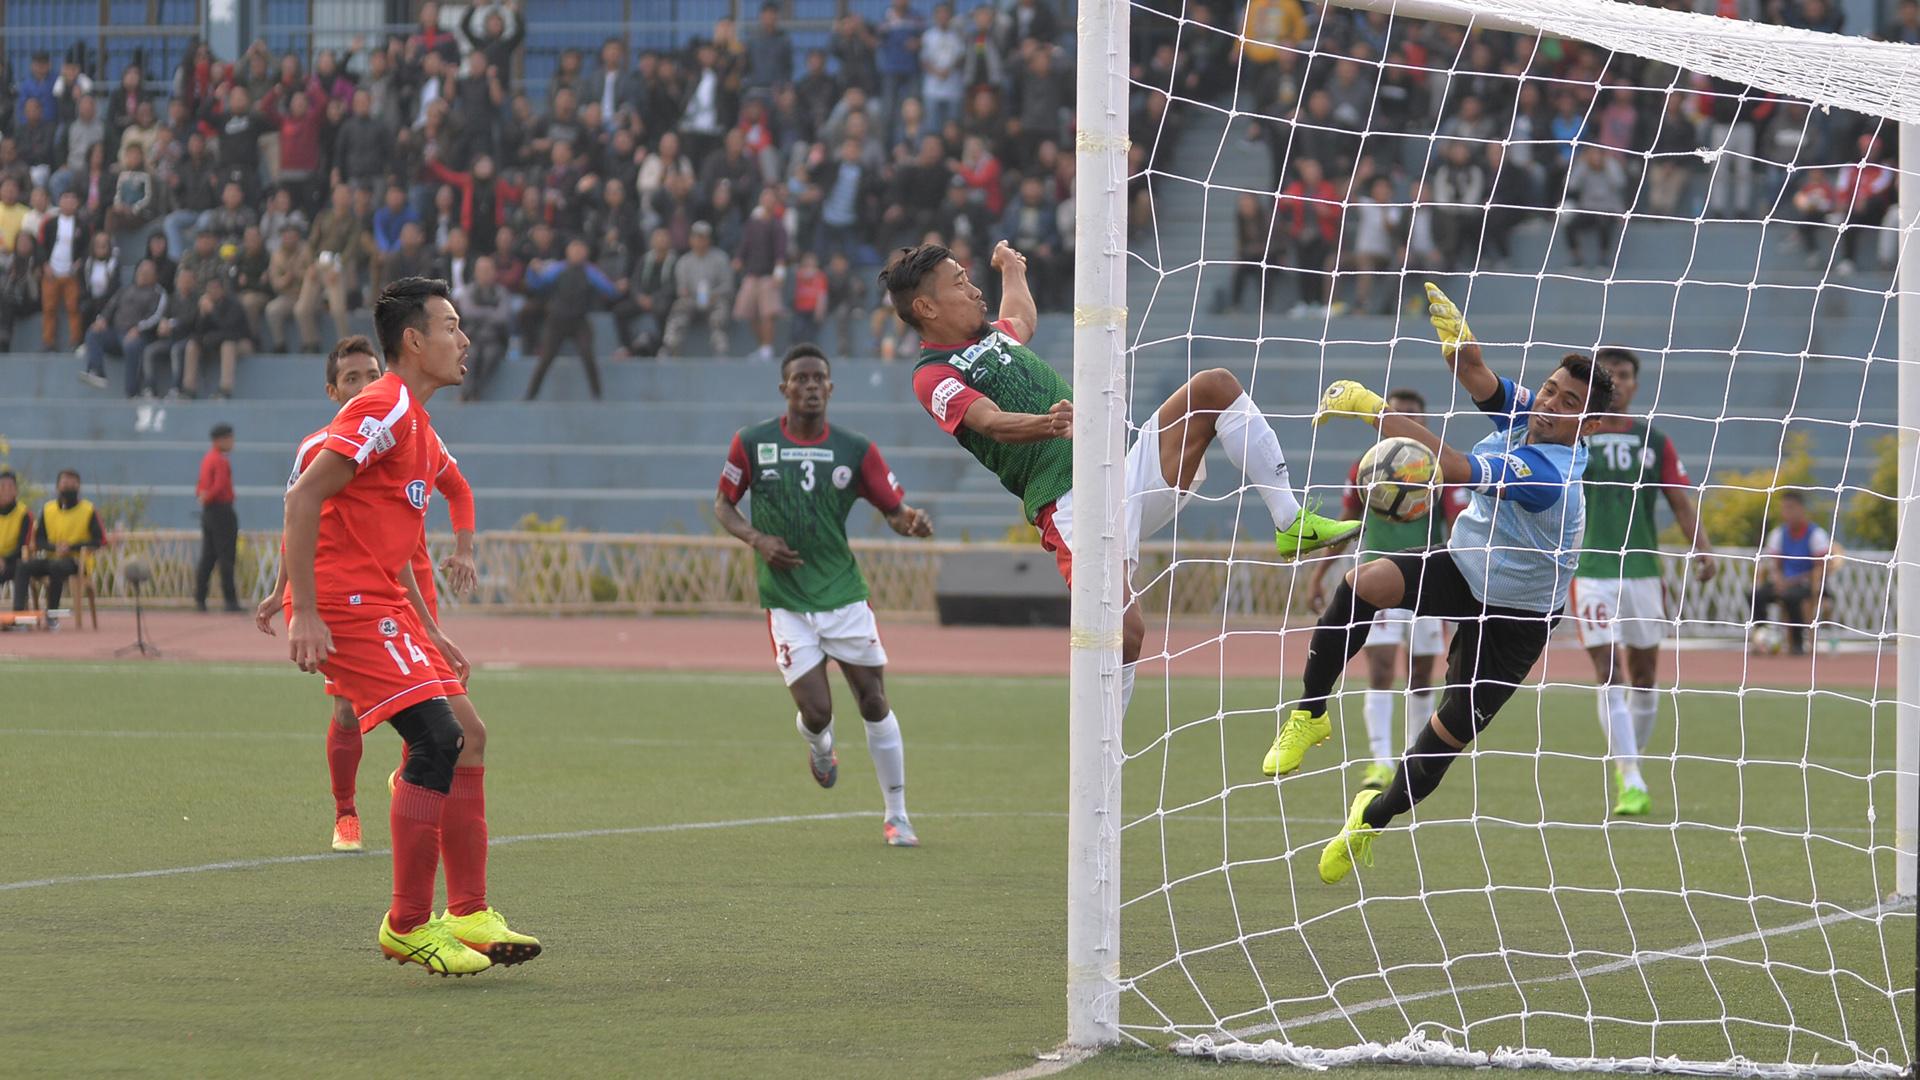 Aizawl FC Mohun Bagan I-League 2017/2018